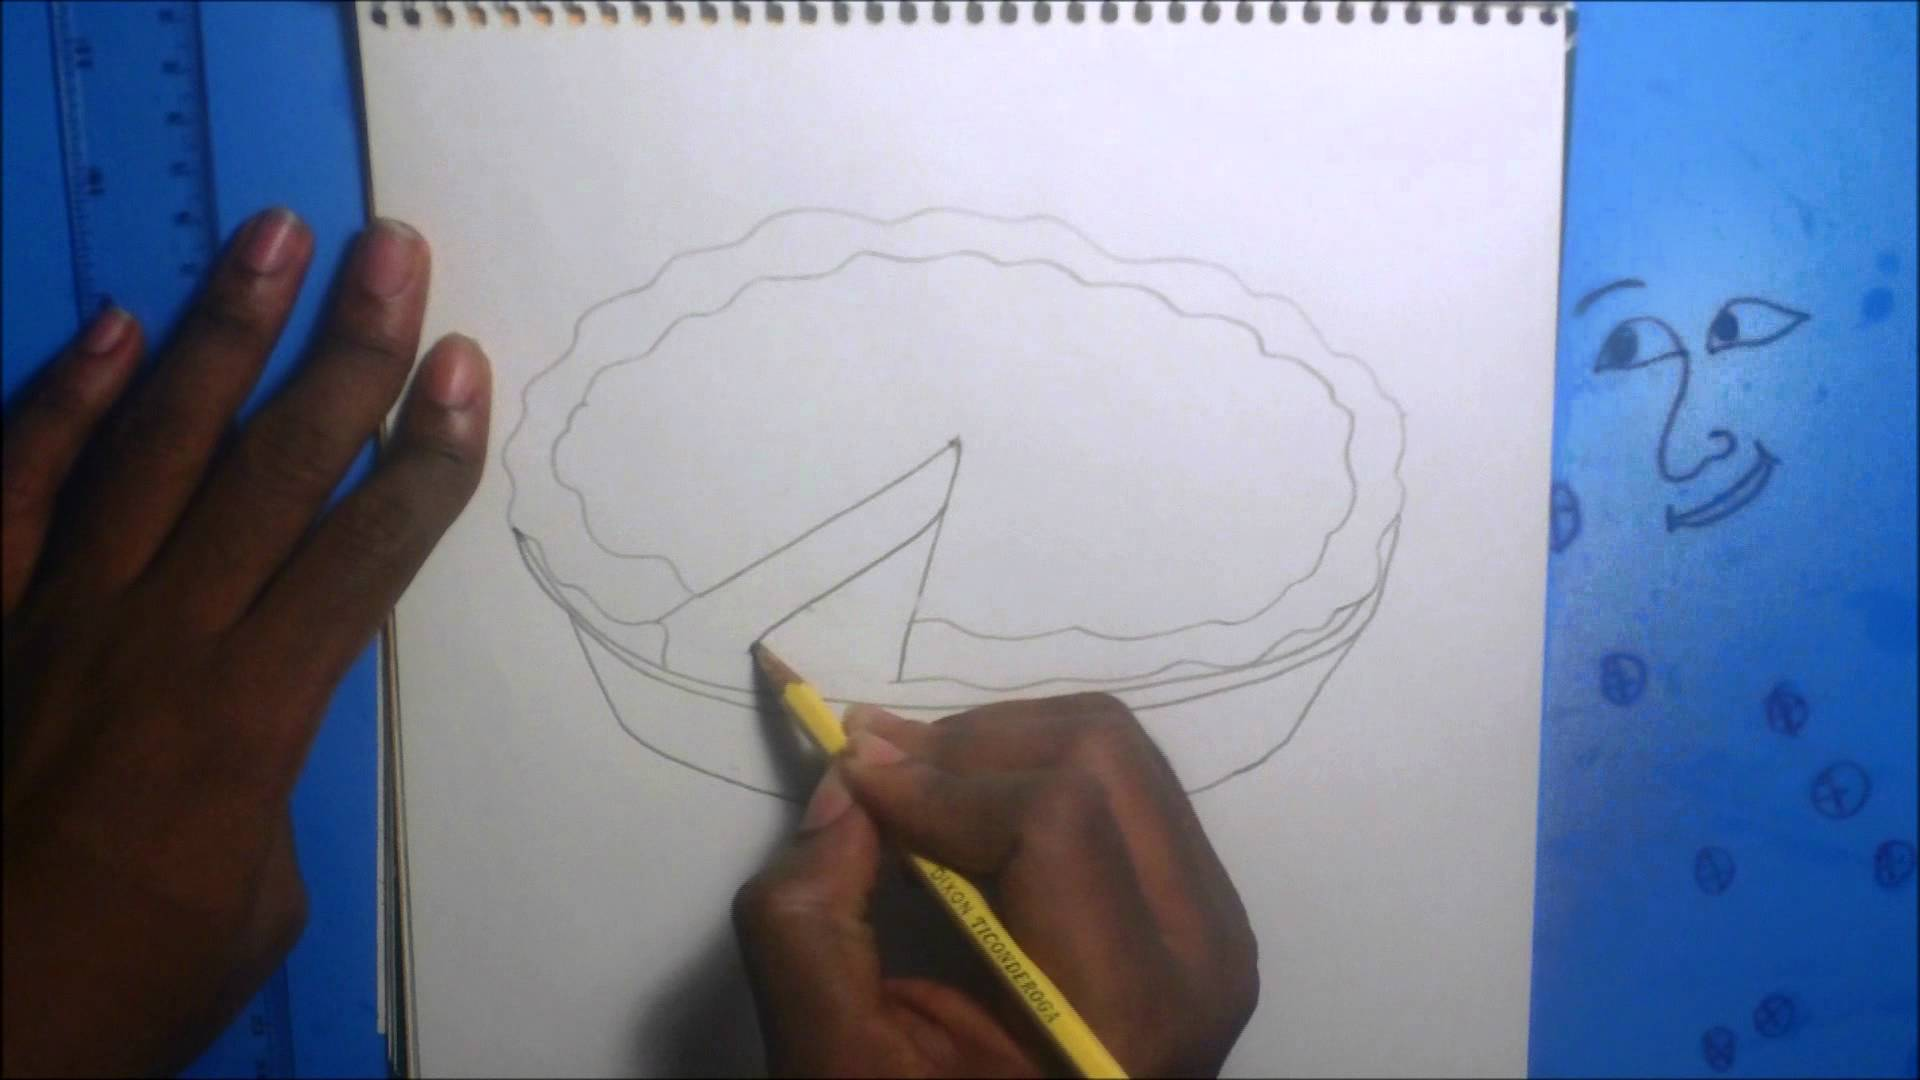 Drawn pies #5